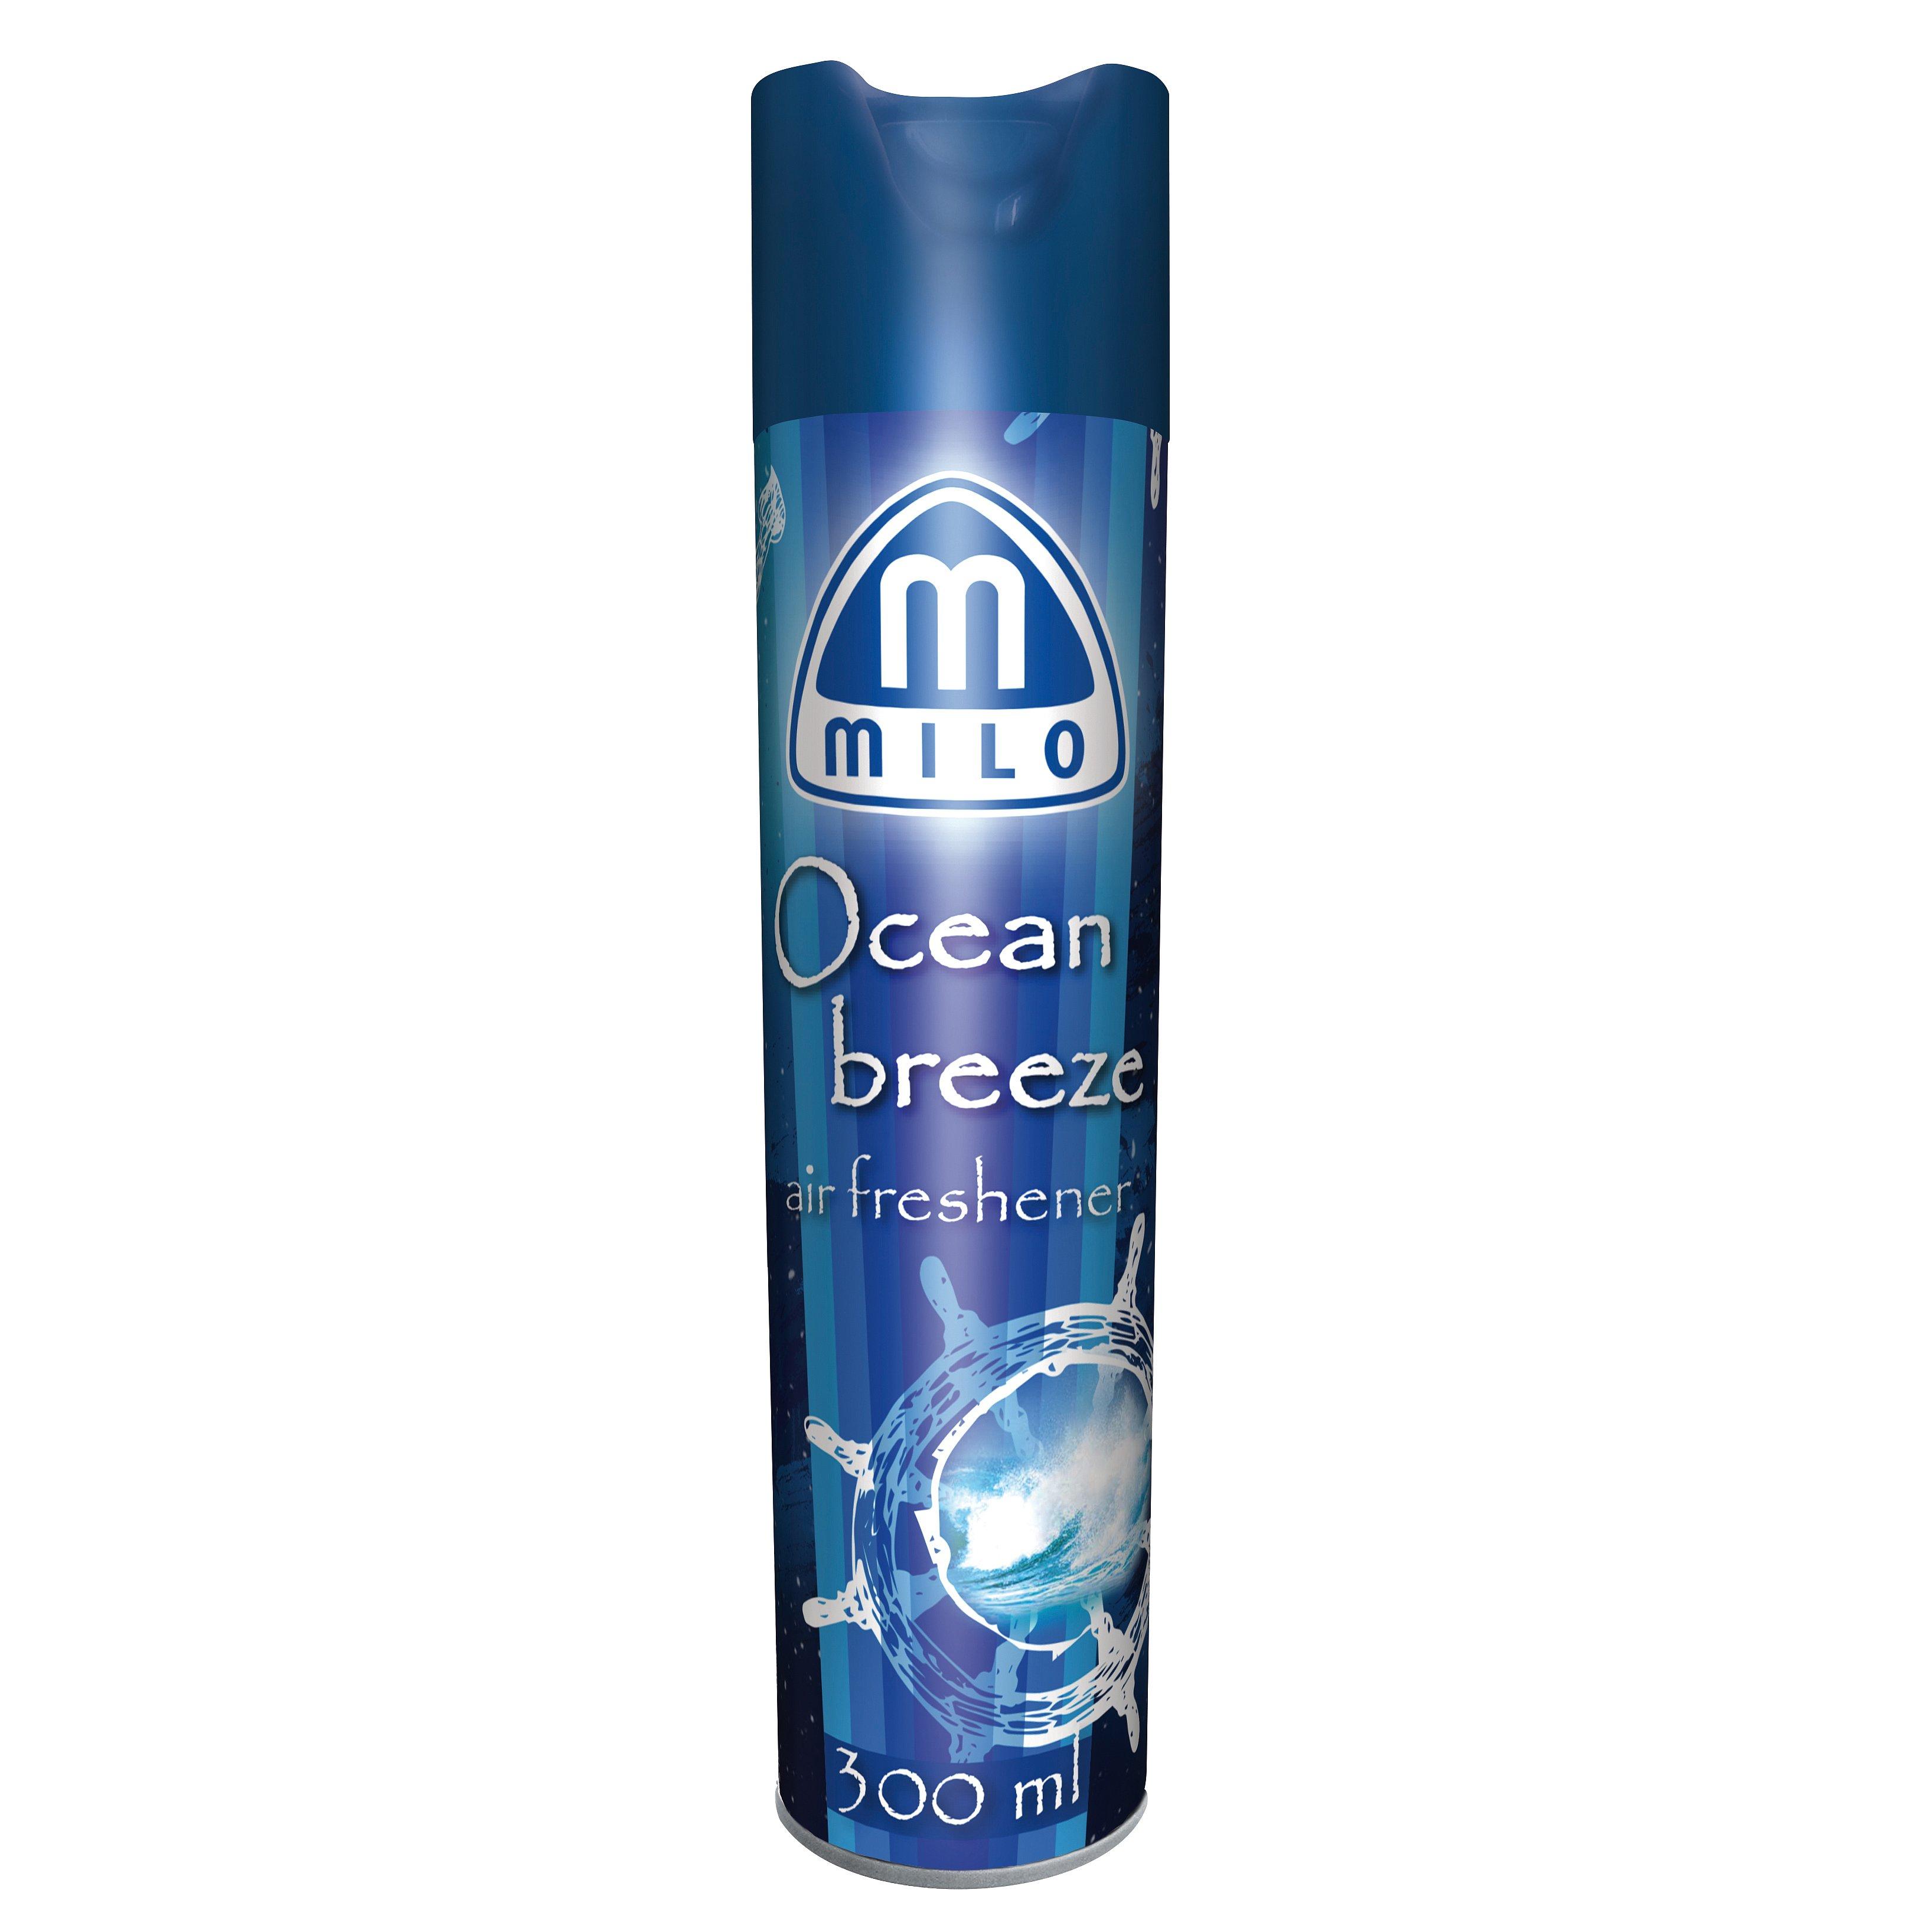 MILO Ocean breeze osvěžovač vzduchu 300 ml